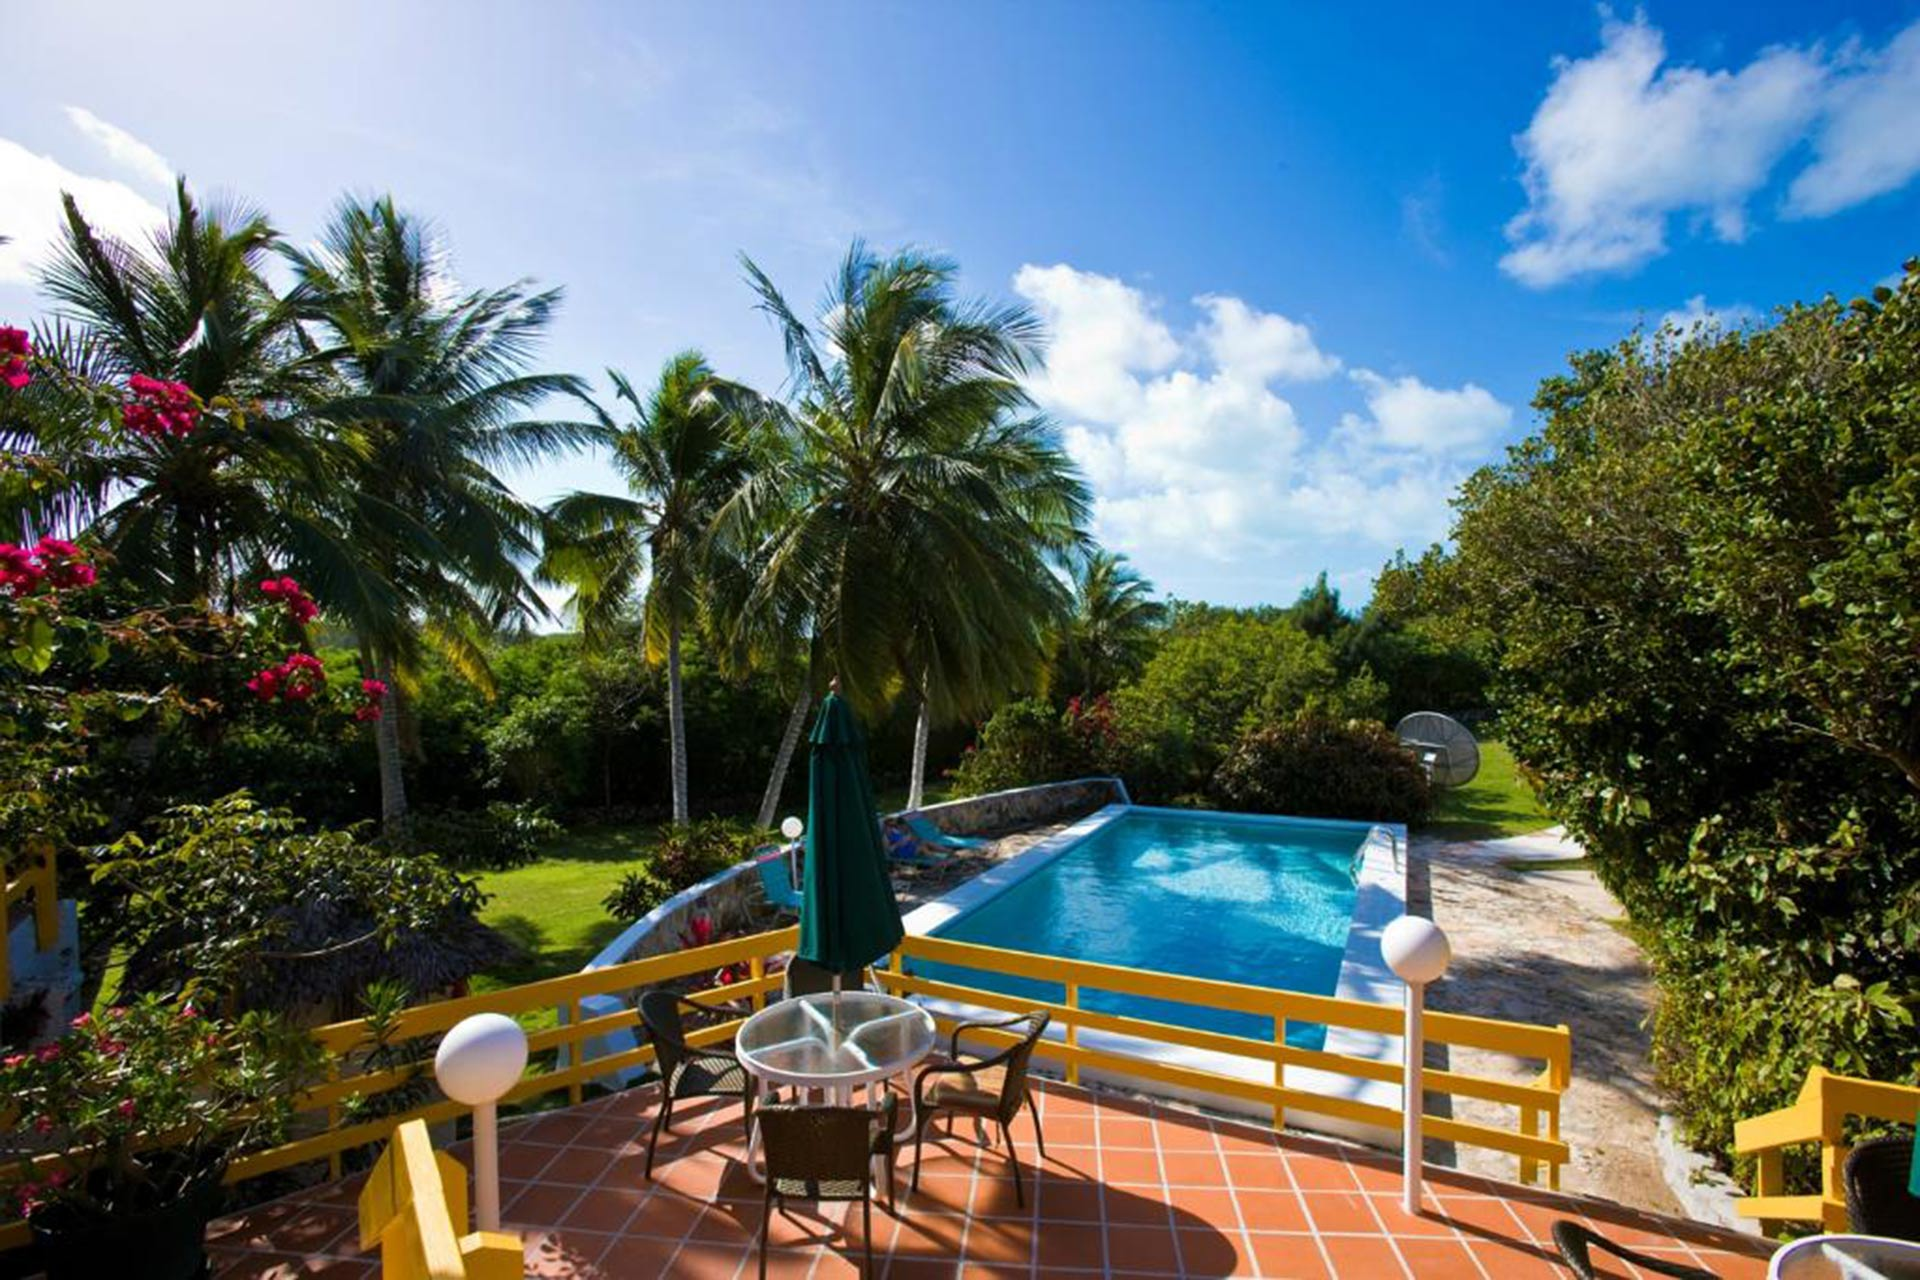 Stella Maris Resort Club in the Bahamas